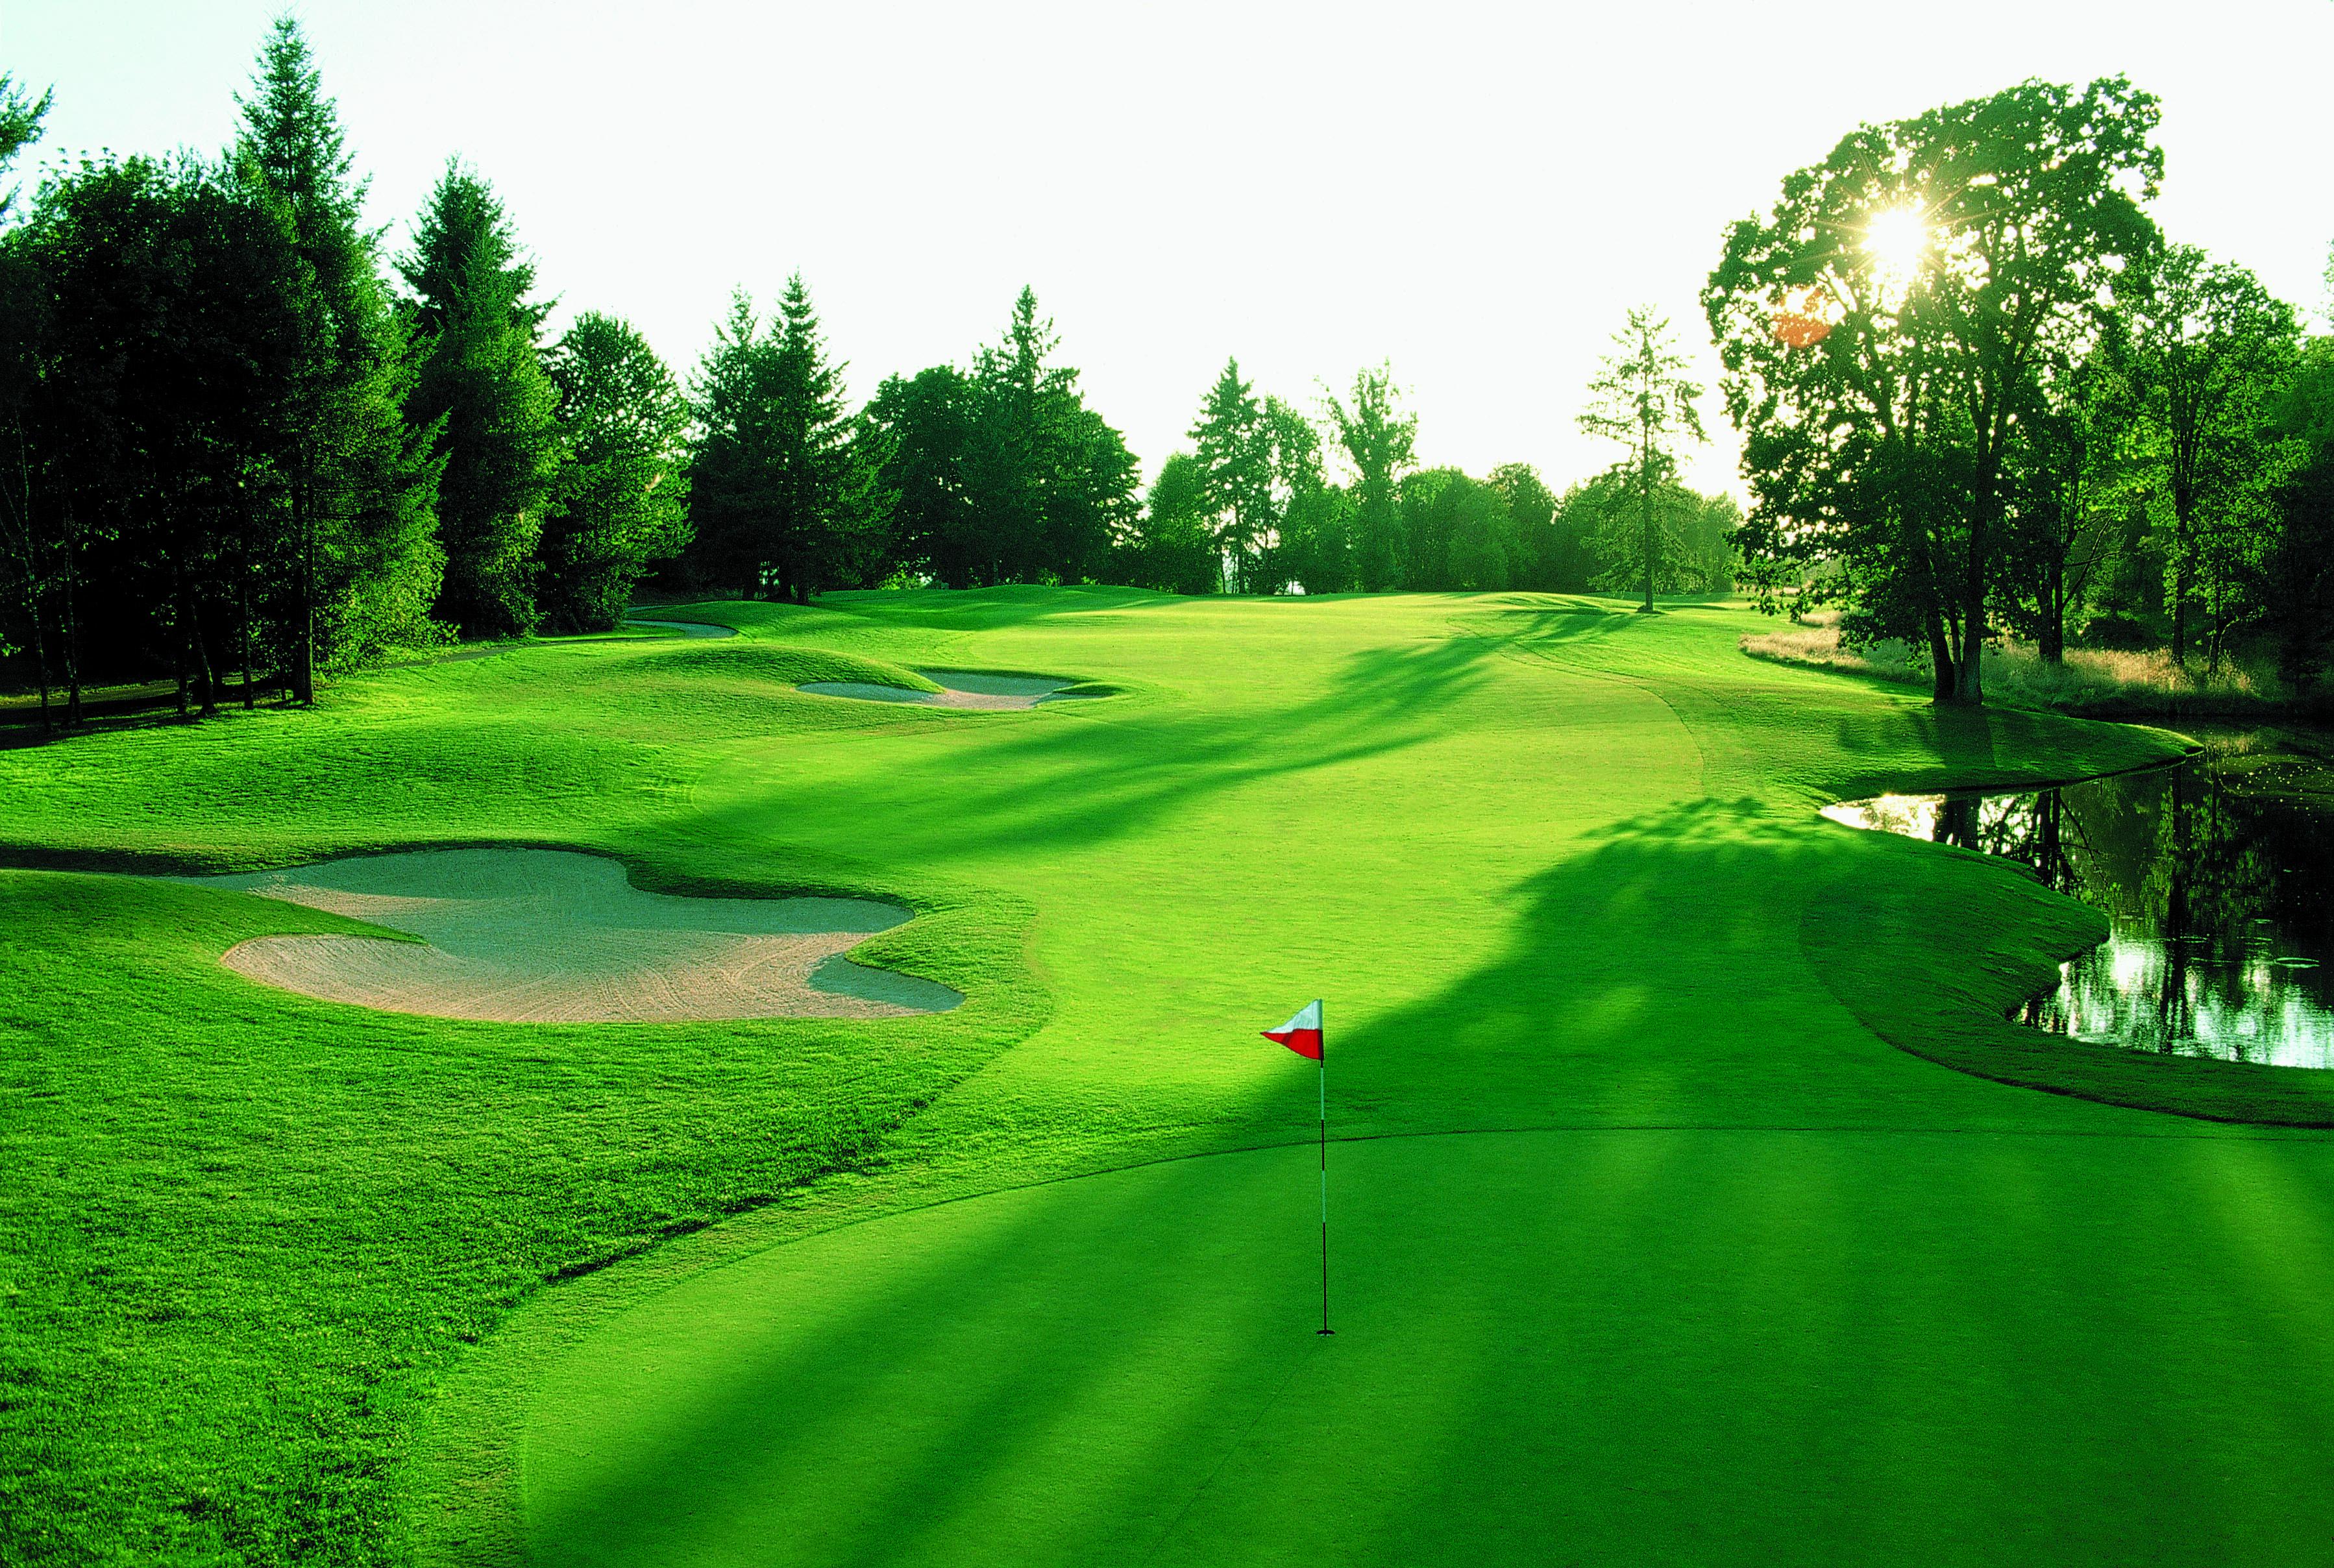 Beautiful Golf Course Desktop Hd Hd Wallpaper 3596x2416